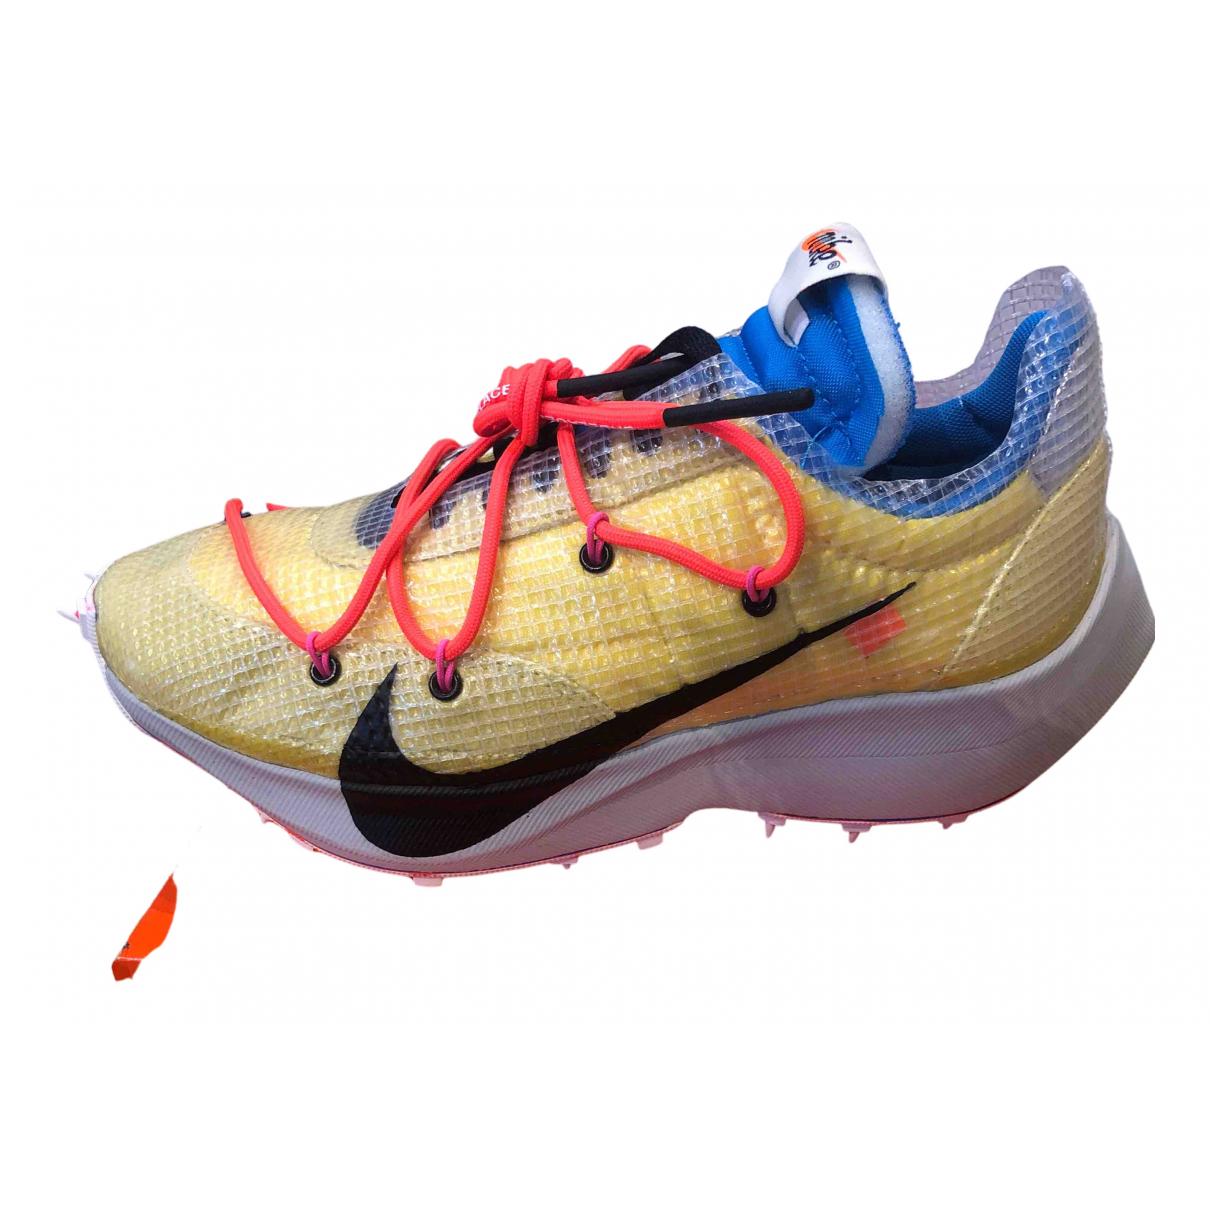 Nike X Off-white - Baskets Vapor Street pour femme - jaune